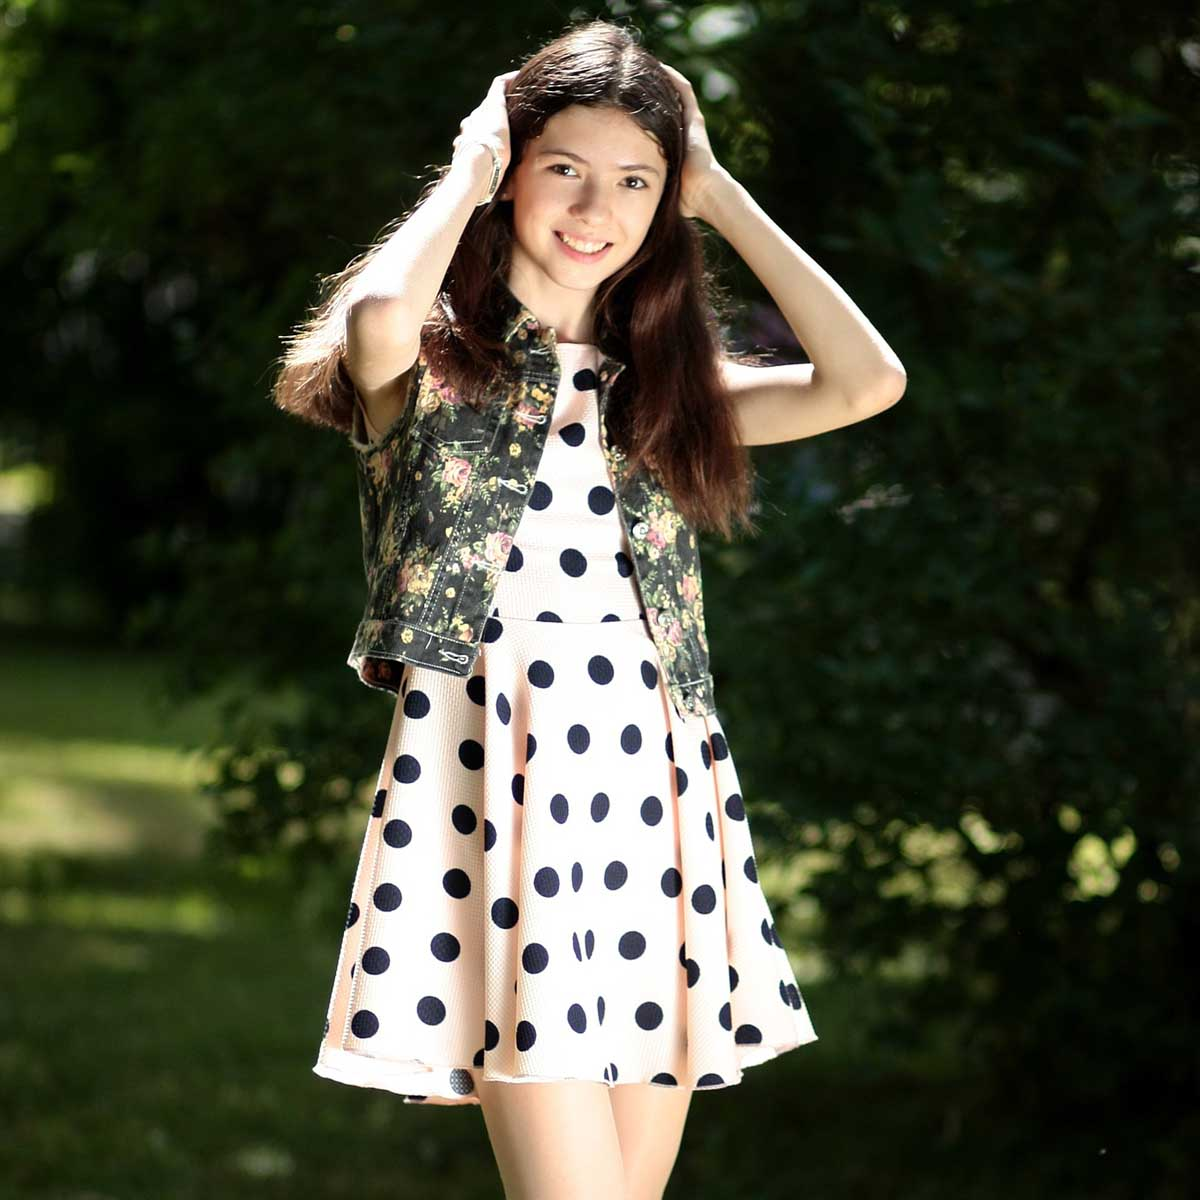 Punkte Kleid Sommerkleid